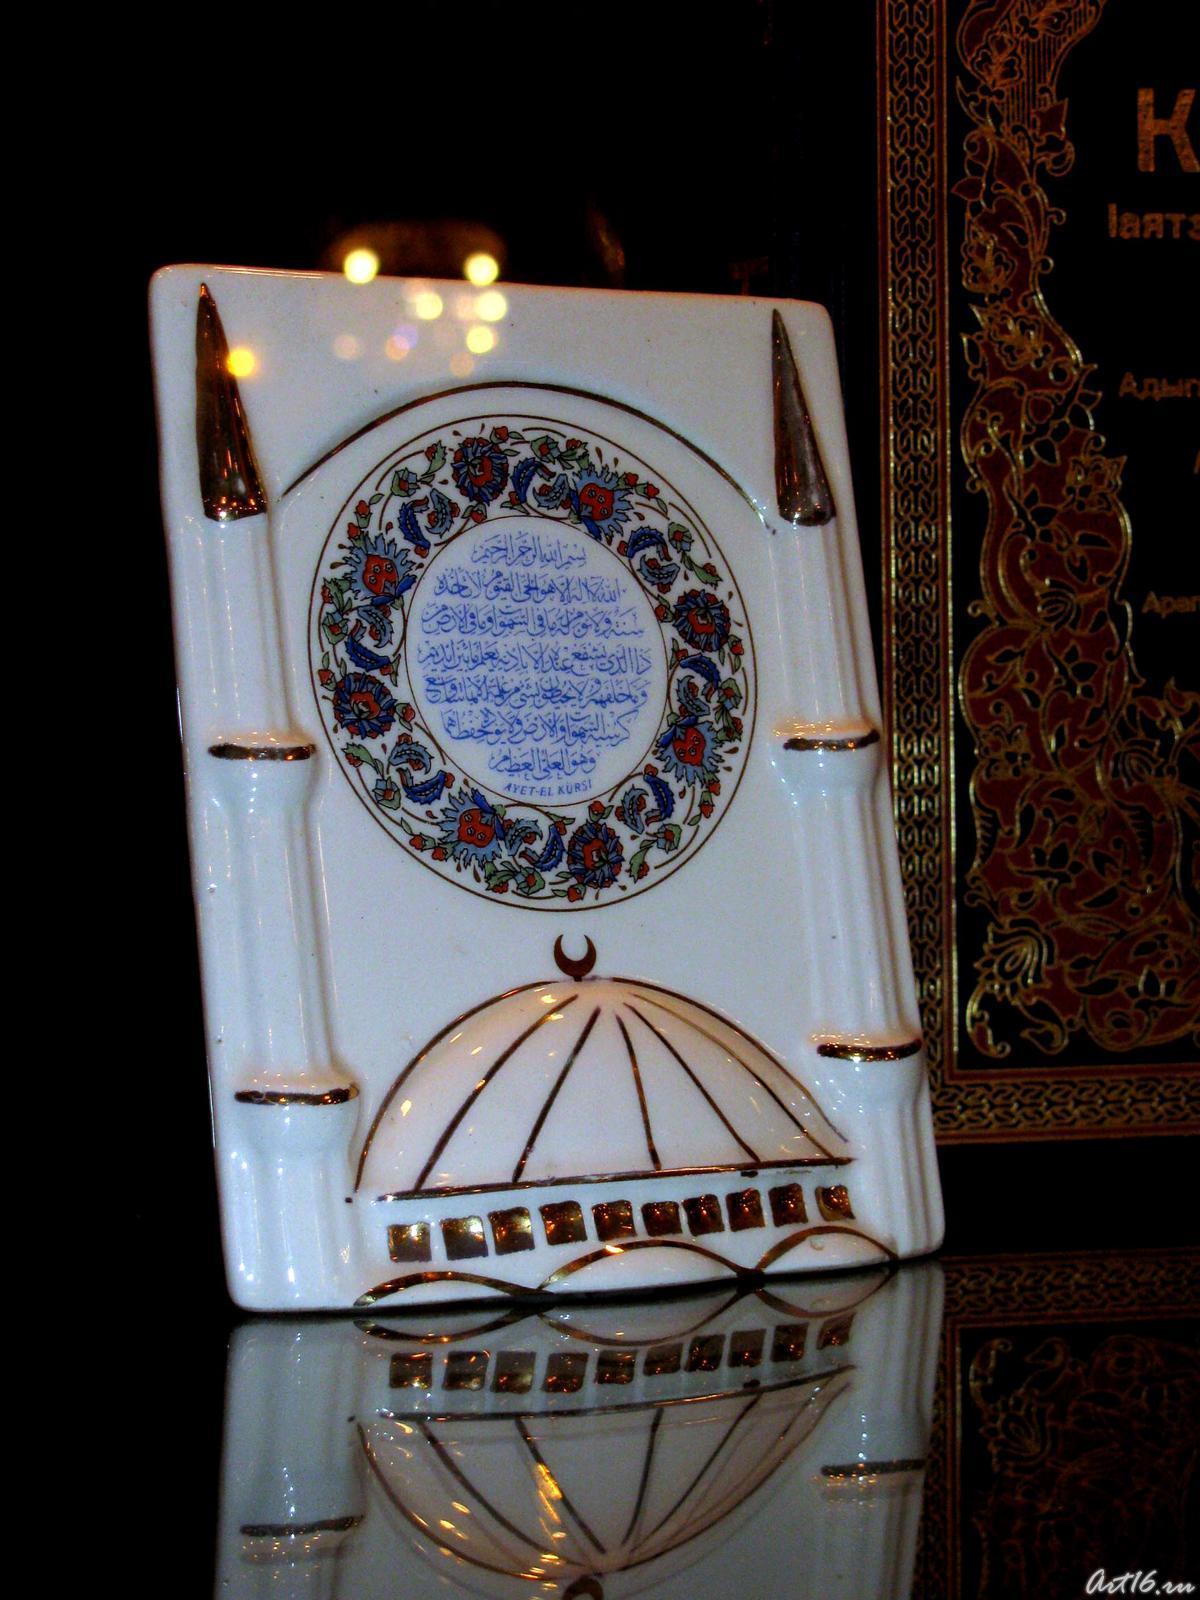 Фото №21846. Выставка ''Свет Корана''_1226